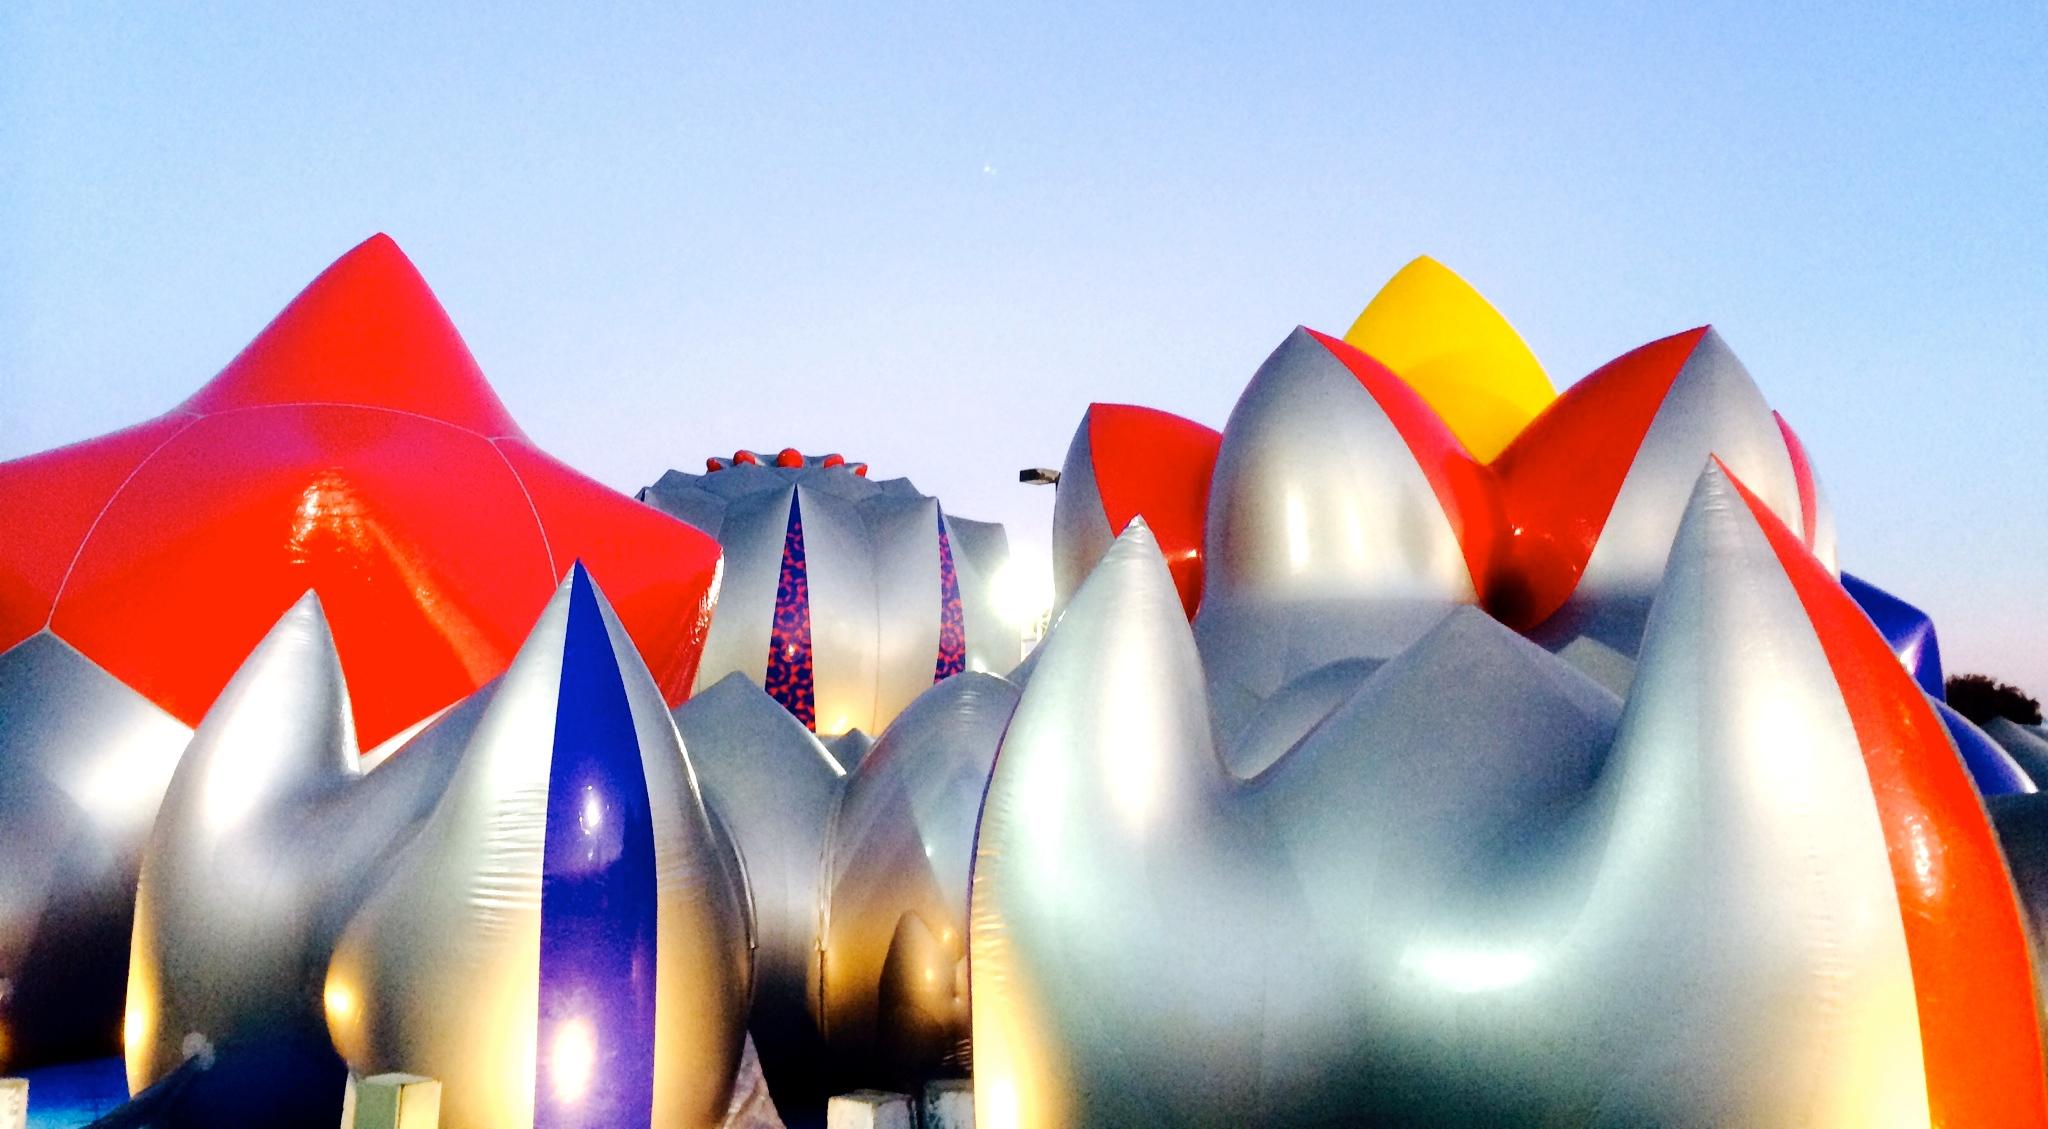 Glow Festival - Exxopolis